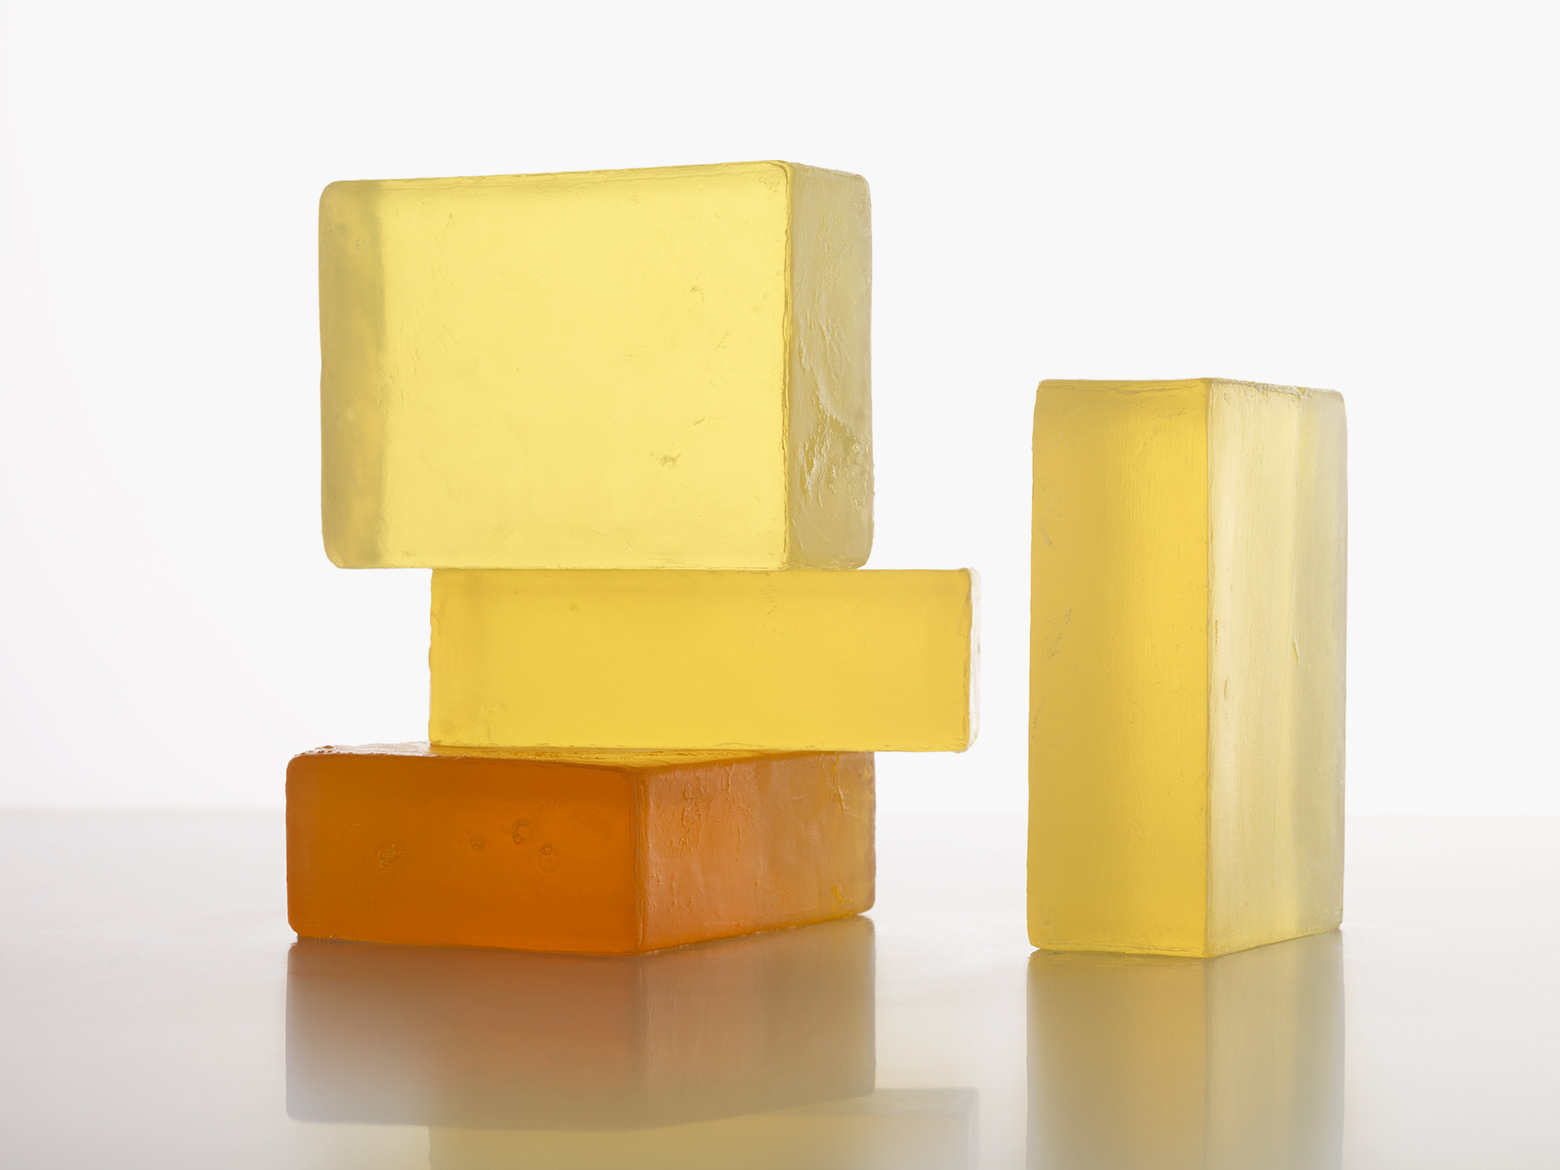 5.SP-R Thumb Soap-Test-3_046.jpg